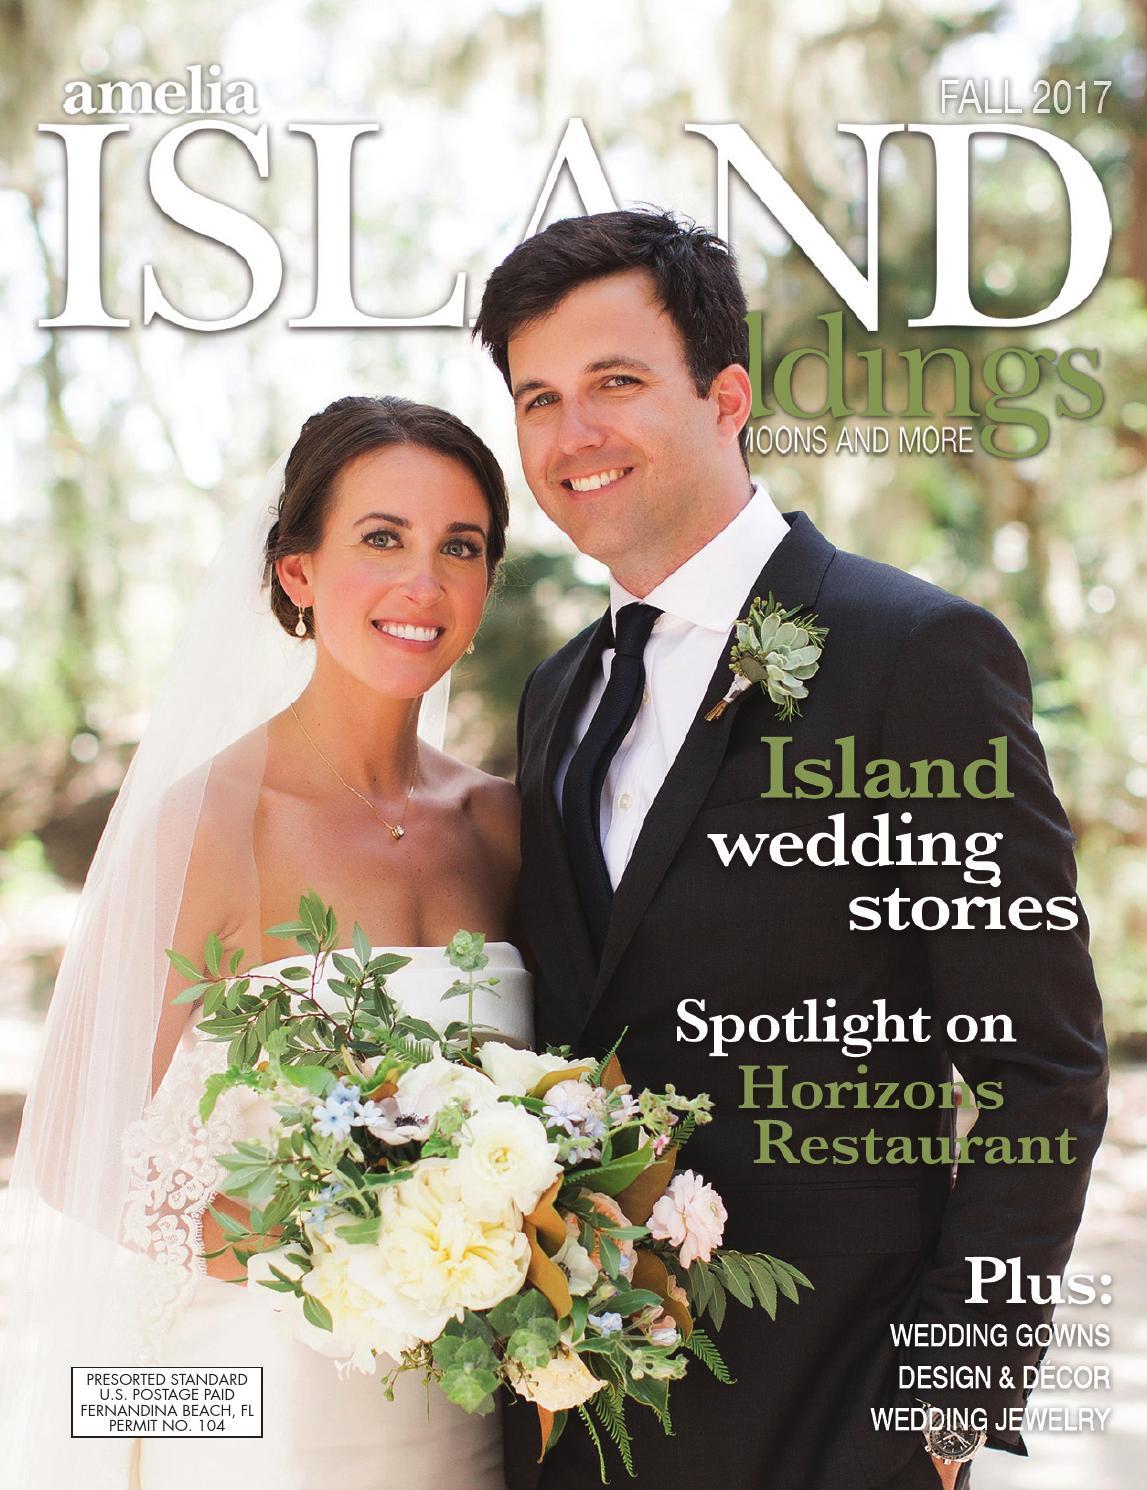 Amelia Island Weddings Fall 2017 By Sweetpea Media Inc Issuu